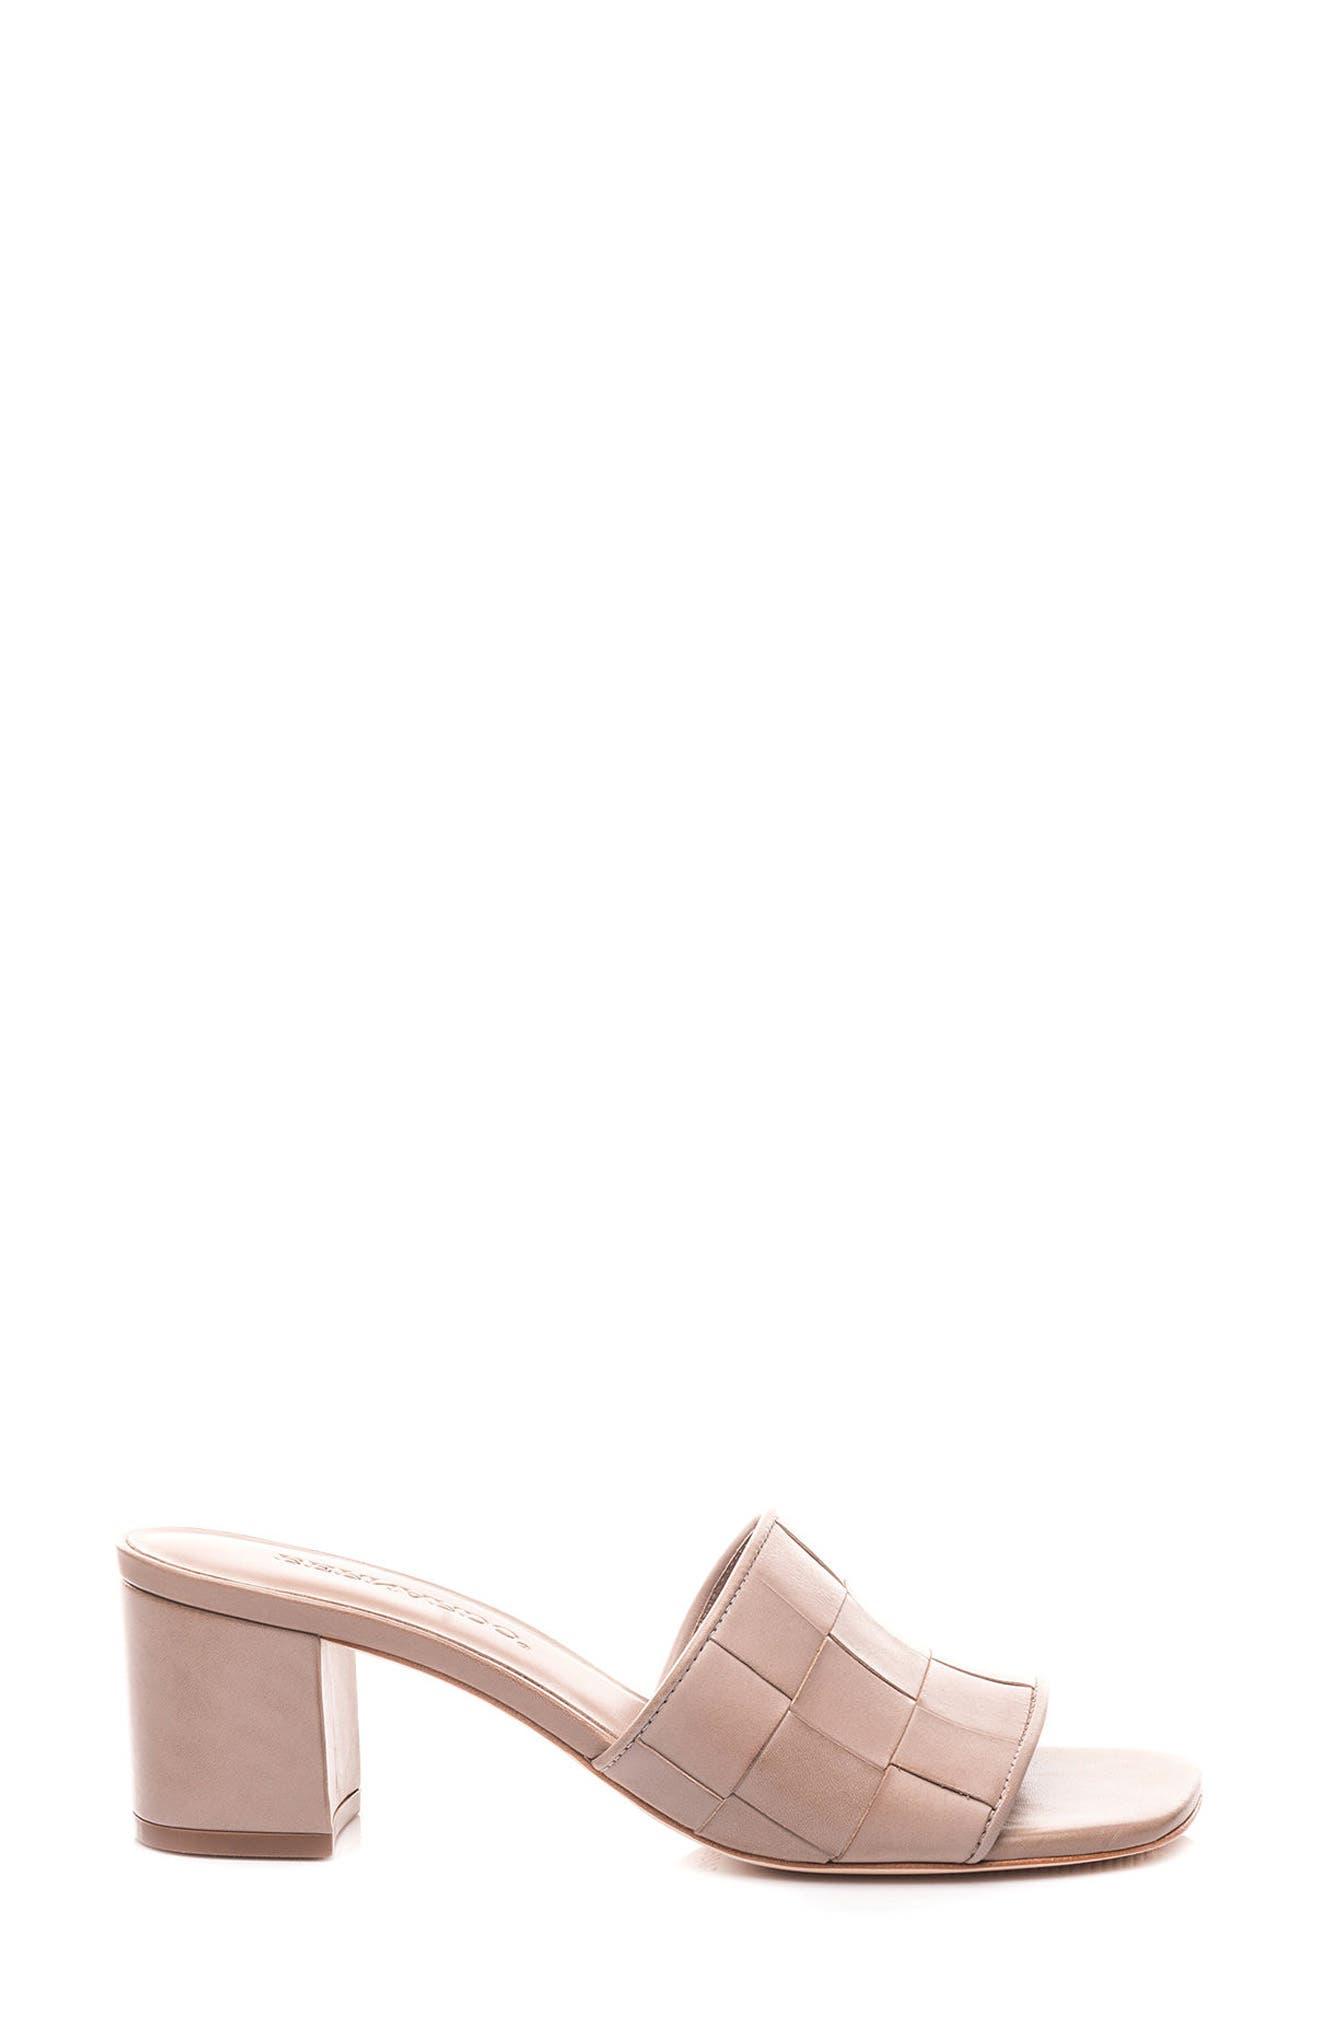 Bernardo Bridget Block Heel Sandal,                             Alternate thumbnail 10, color,